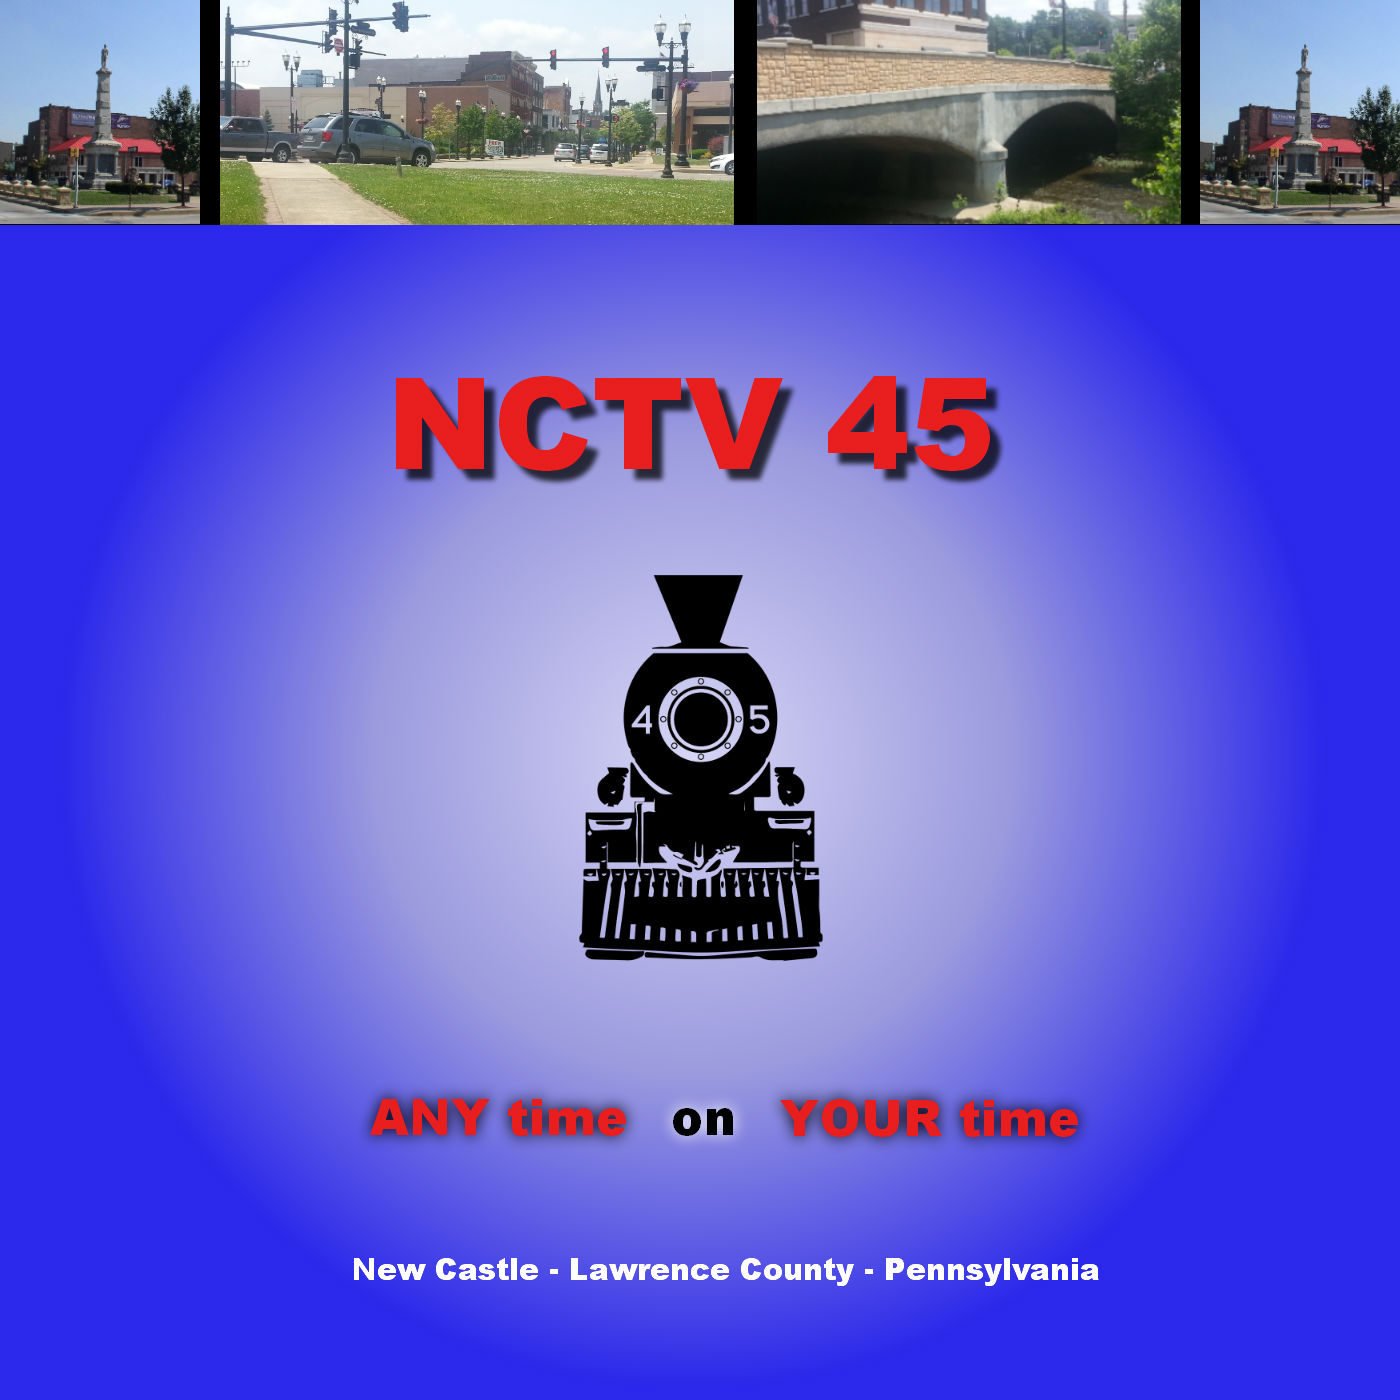 Artwork for NCTV45'S NewsWatch NewsBrief LCHS Event April 16 2018